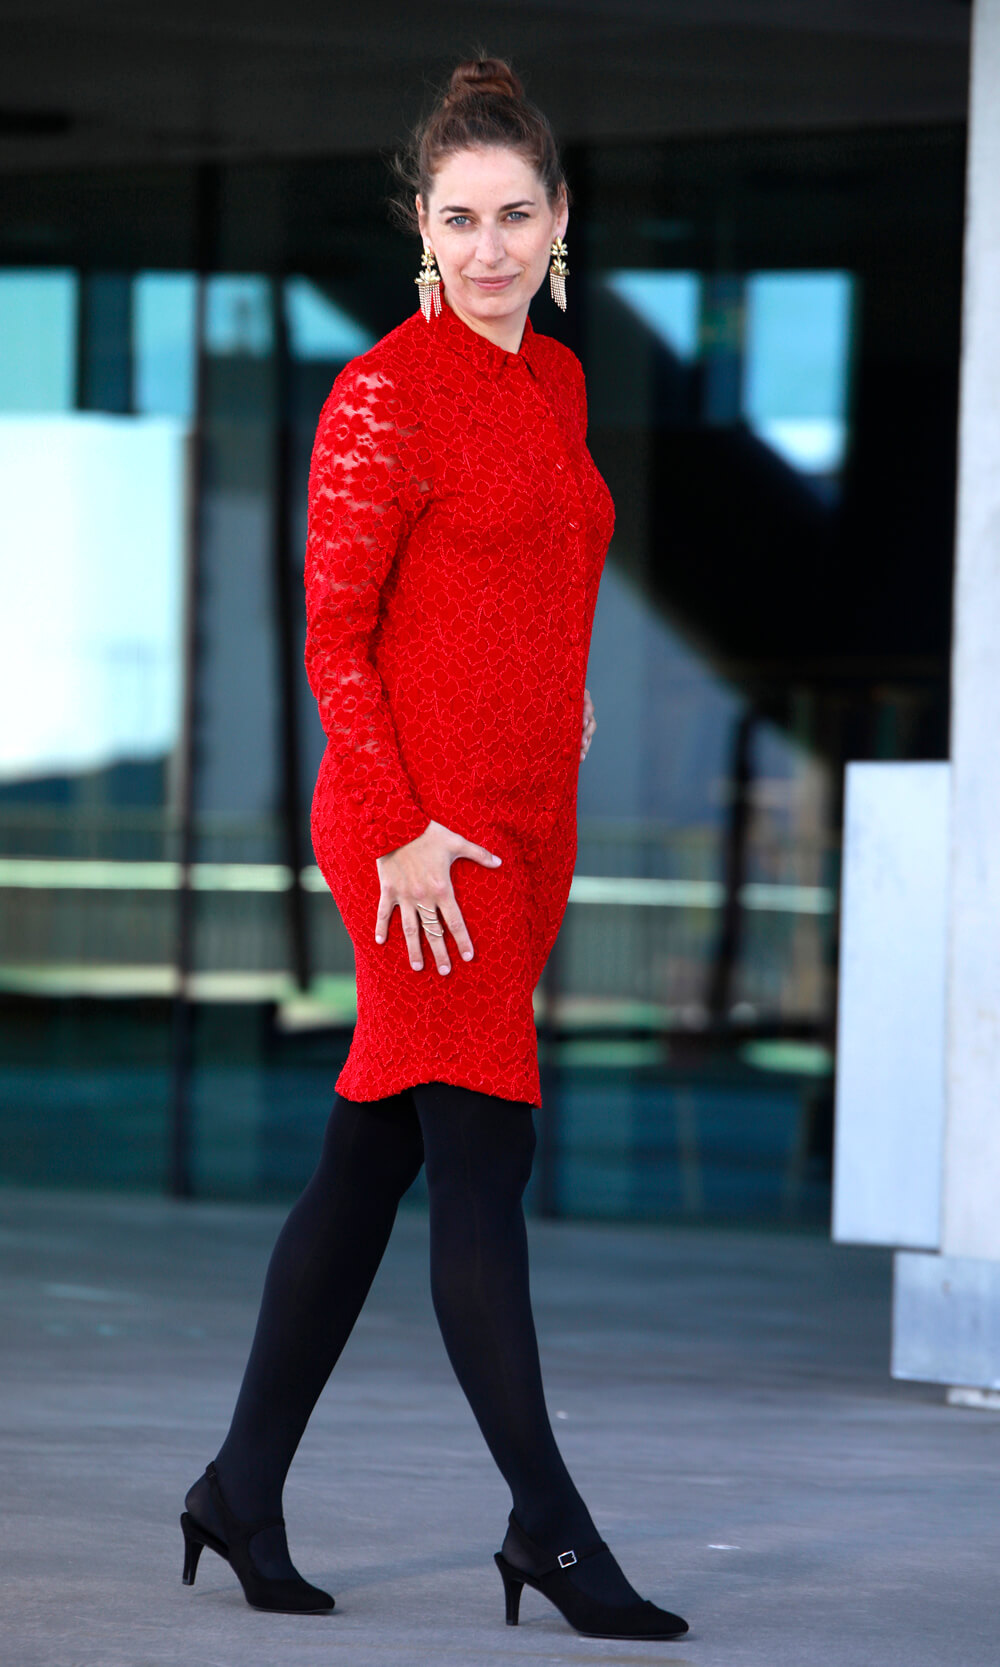 Rød blonde skjortekjole